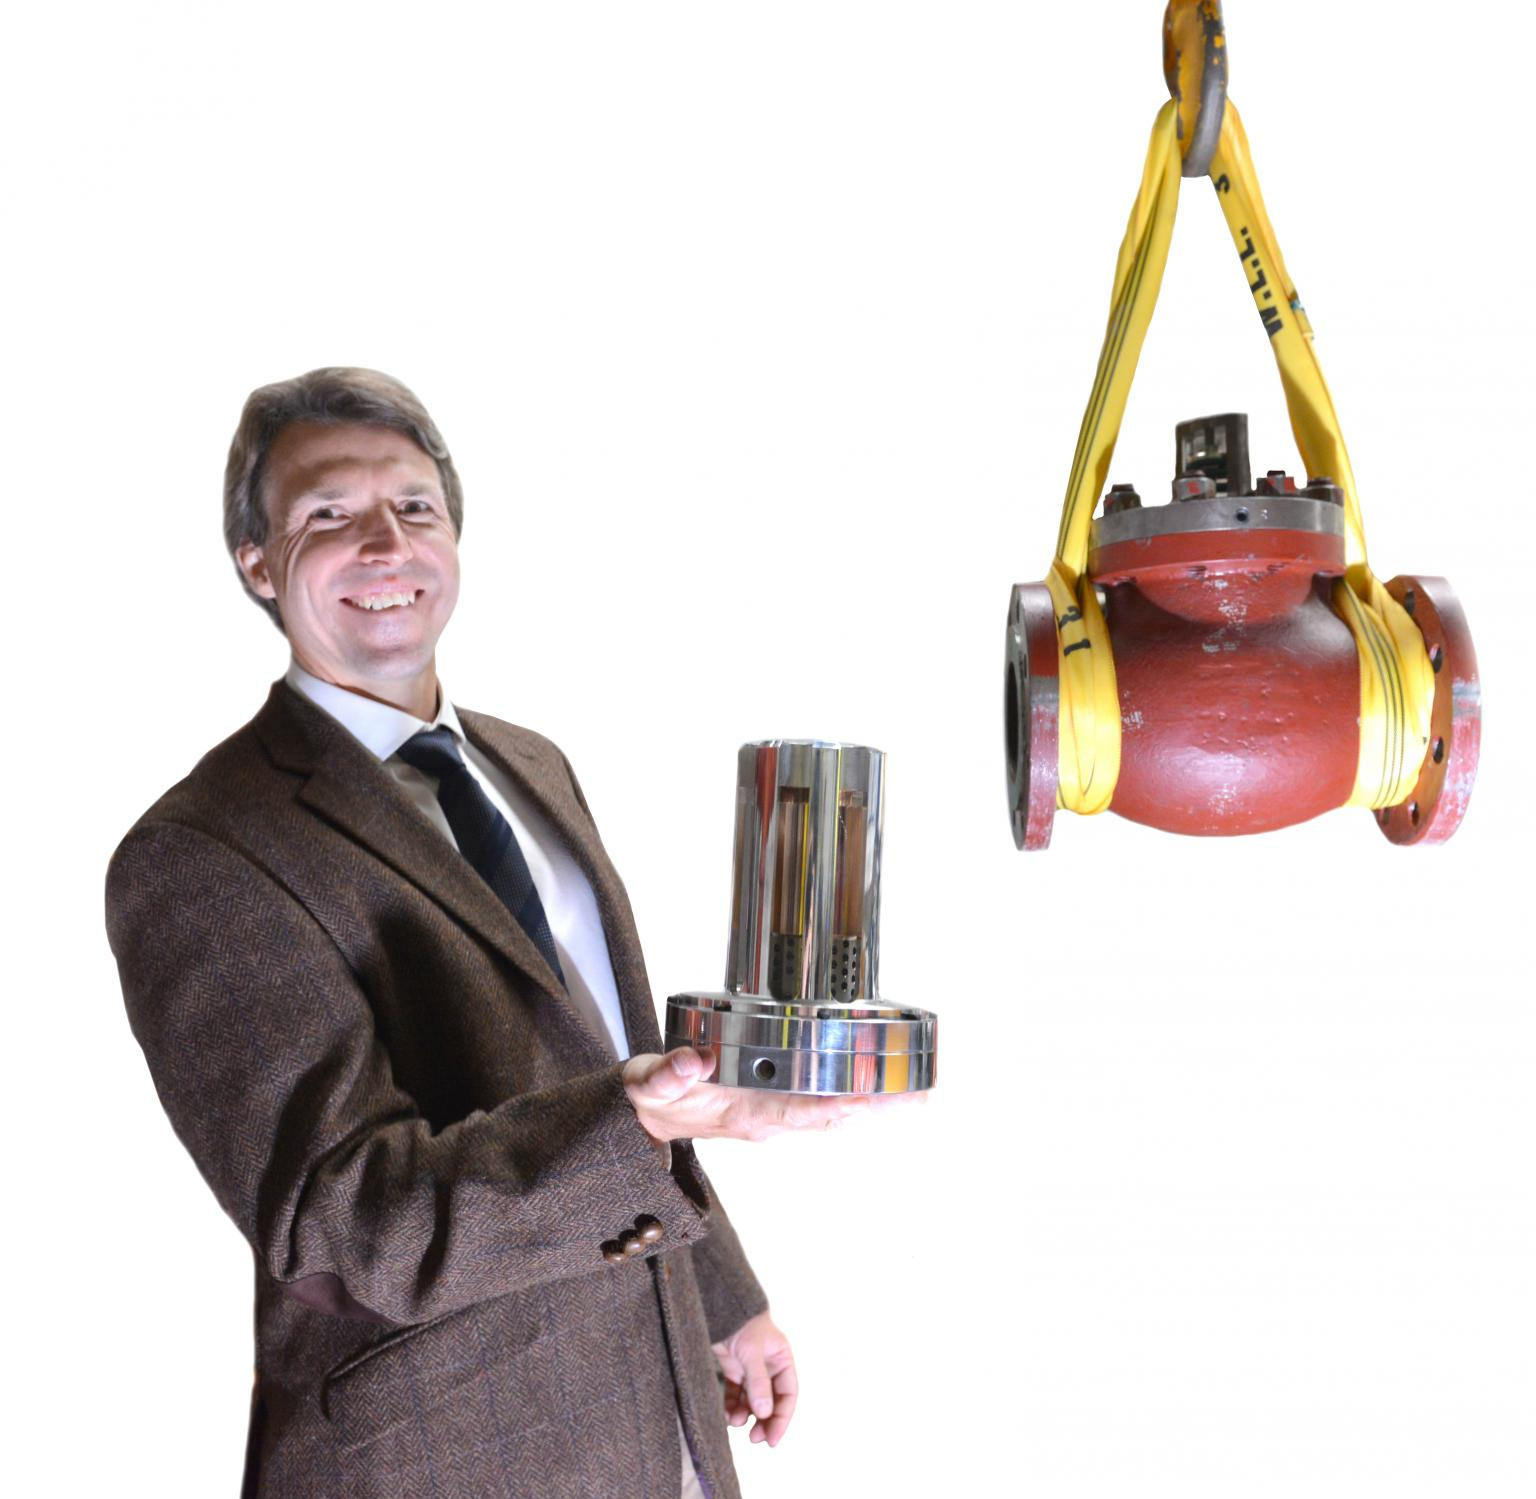 Professor Tom Povey and his lightweight flow regulator